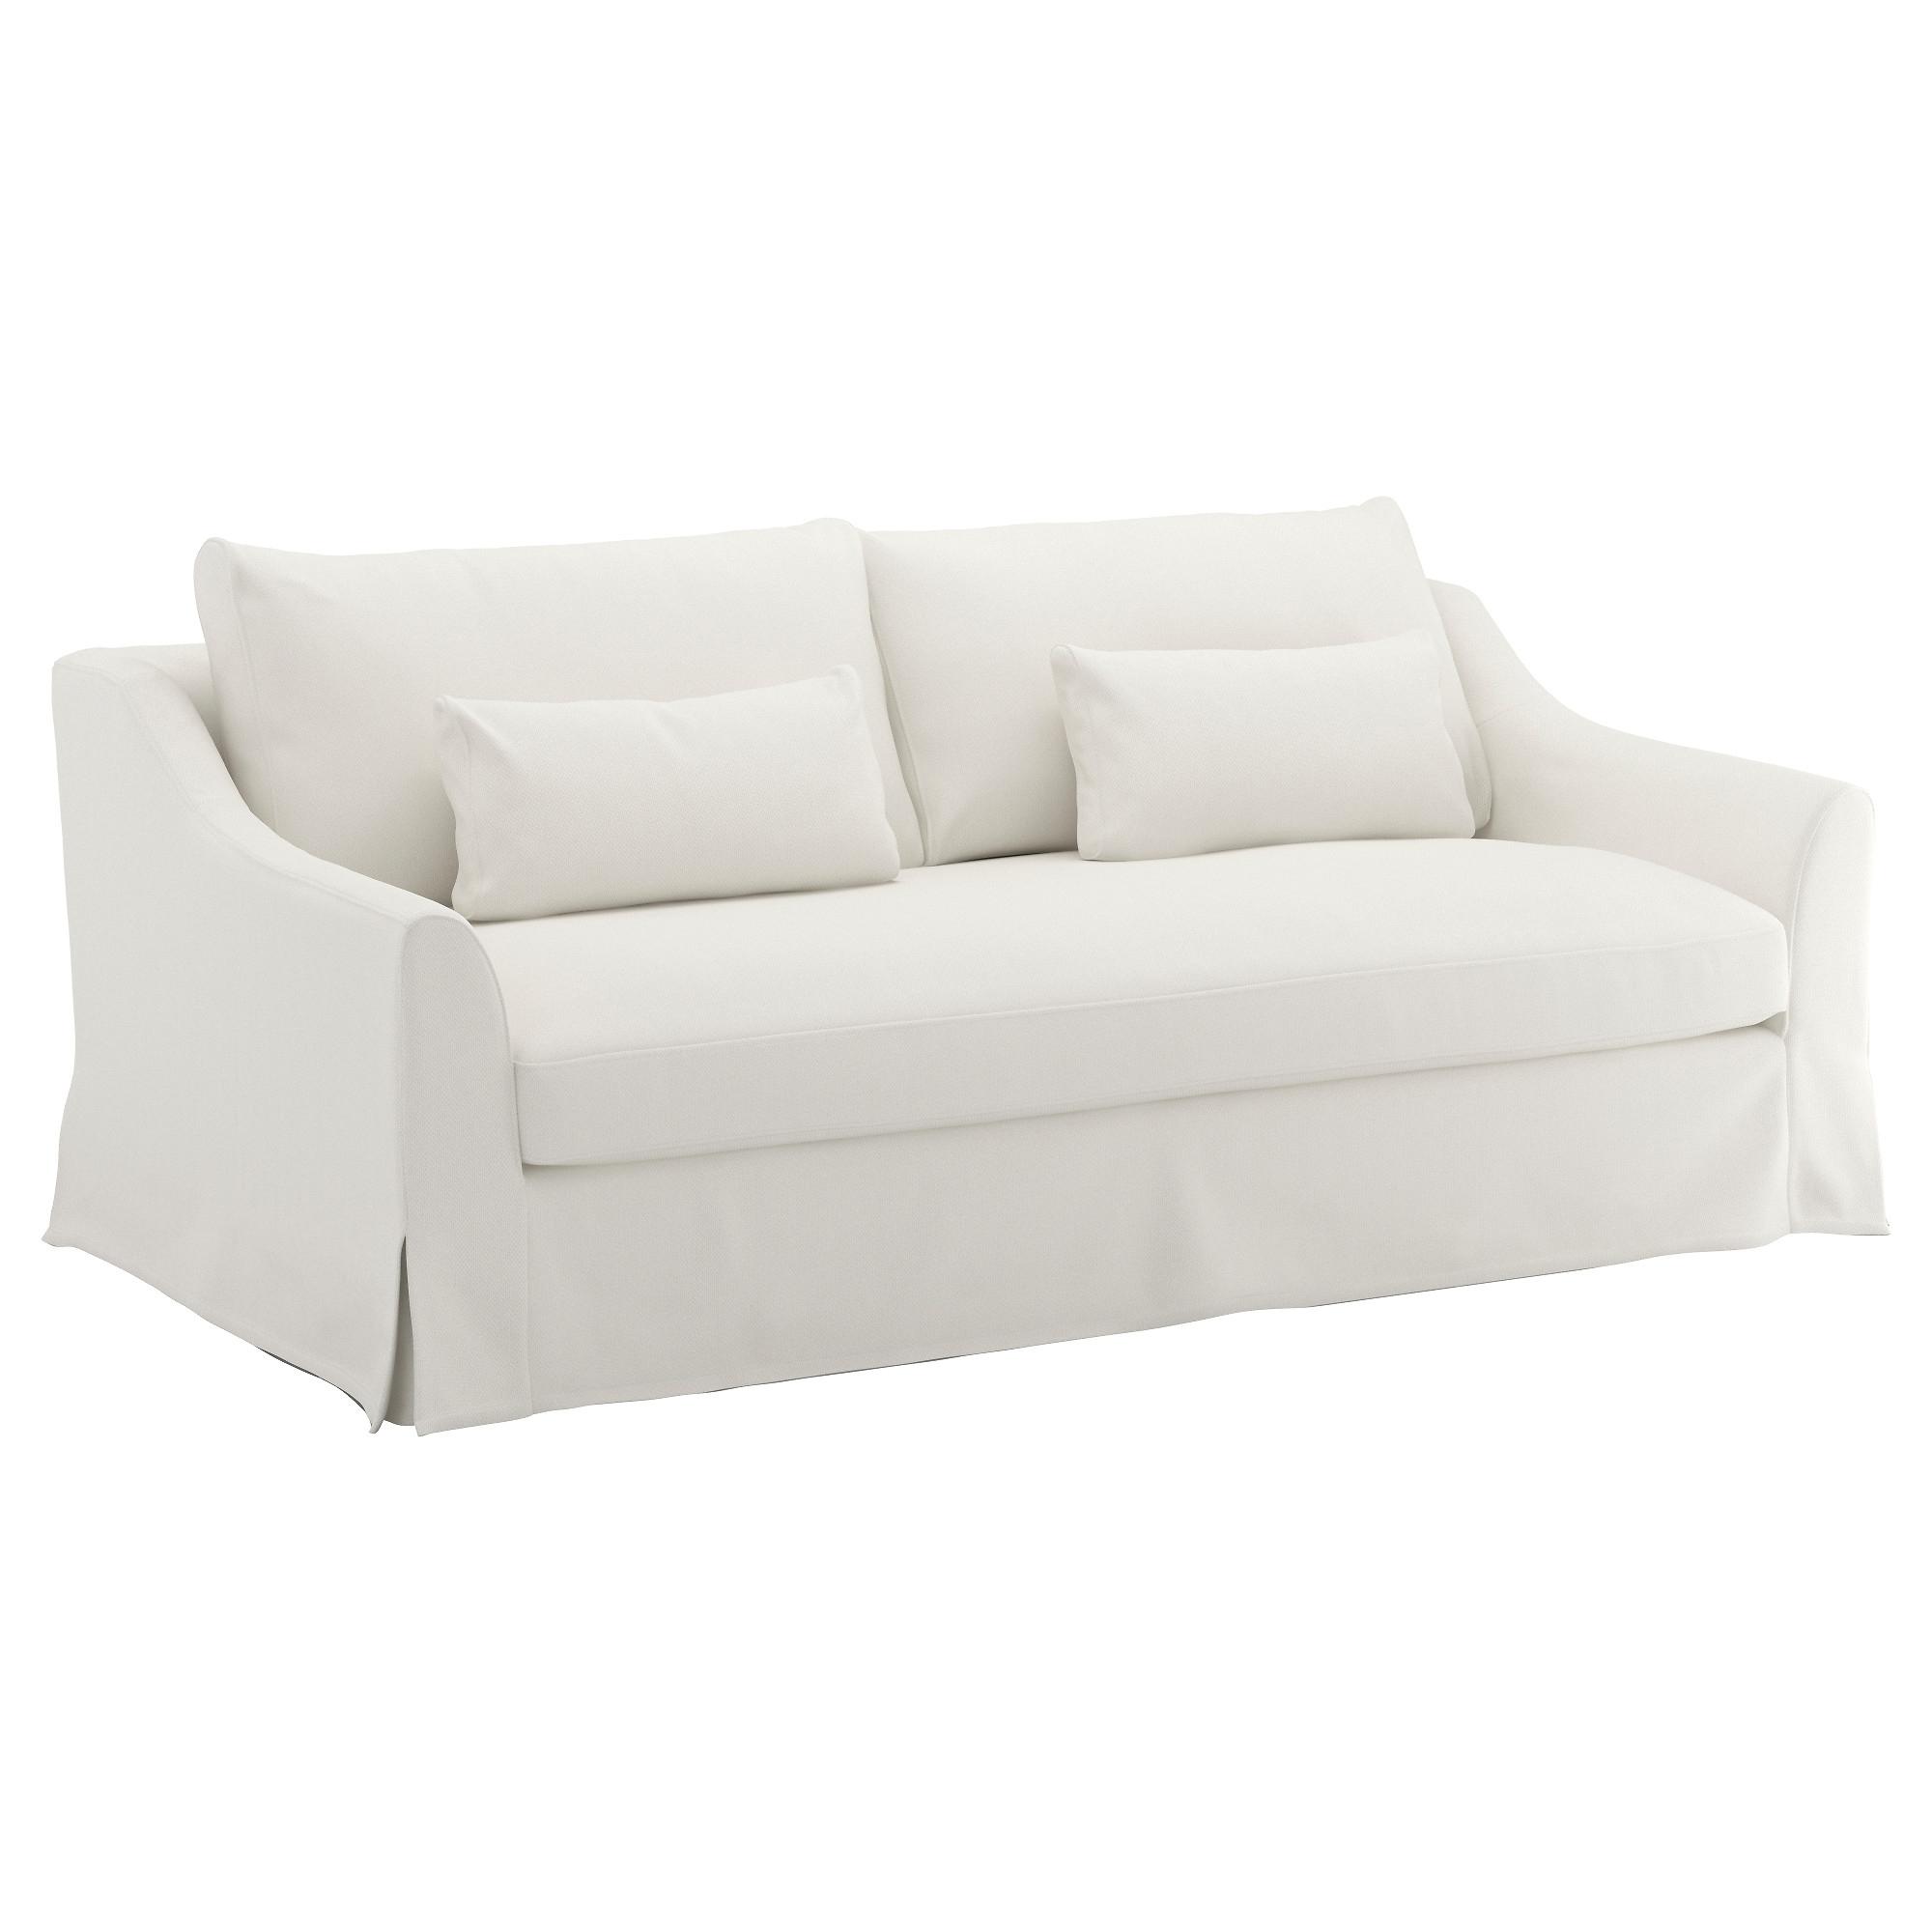 20 Ideas Of White Sofa Chairs